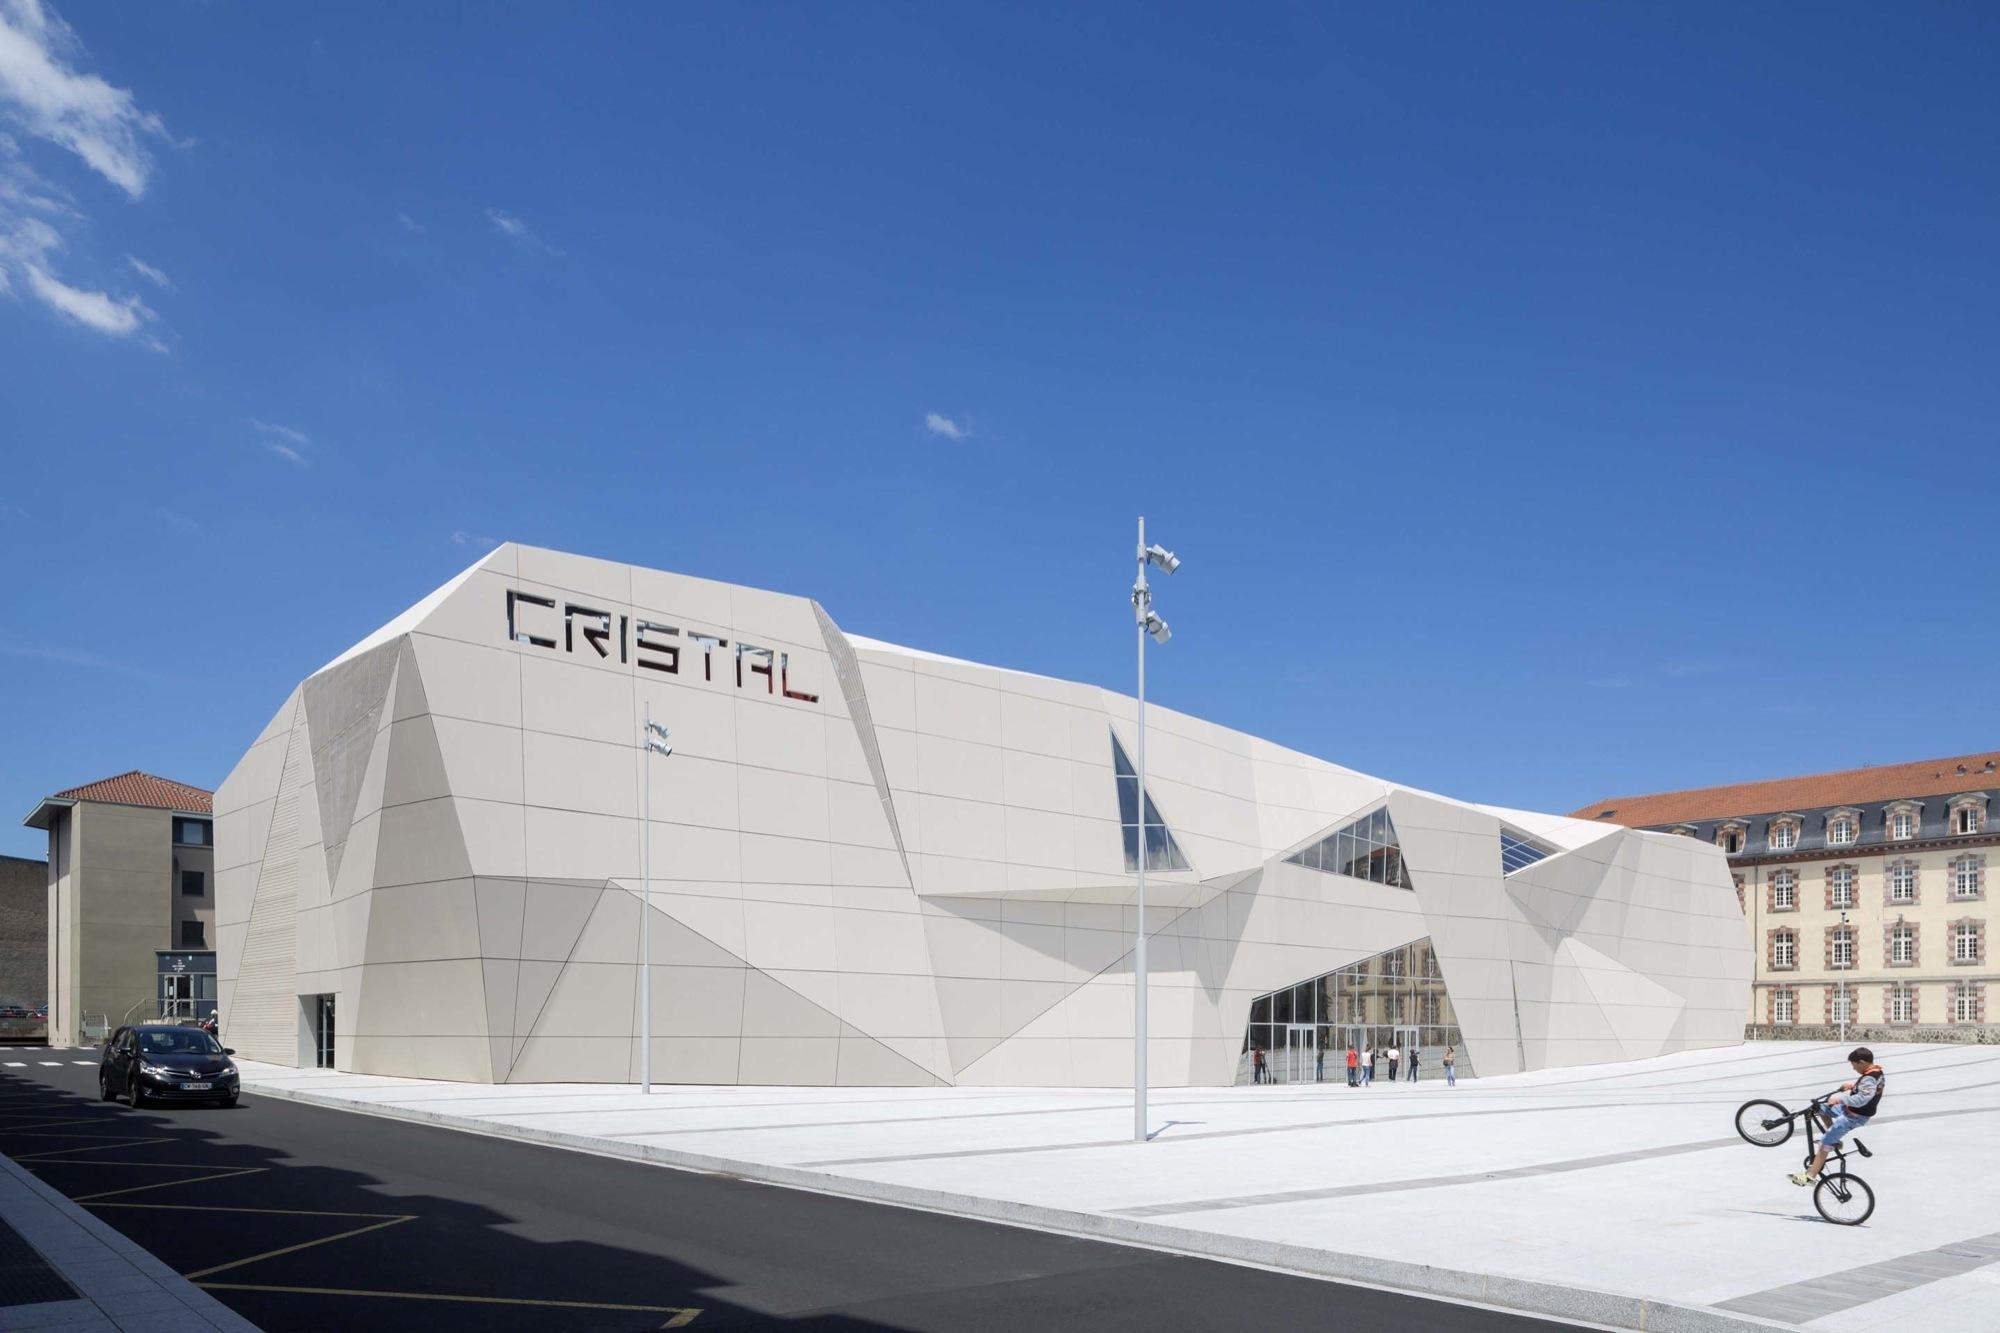 Gallery of Le Cristal Cinema and Michel Crespin Square / Linéaire